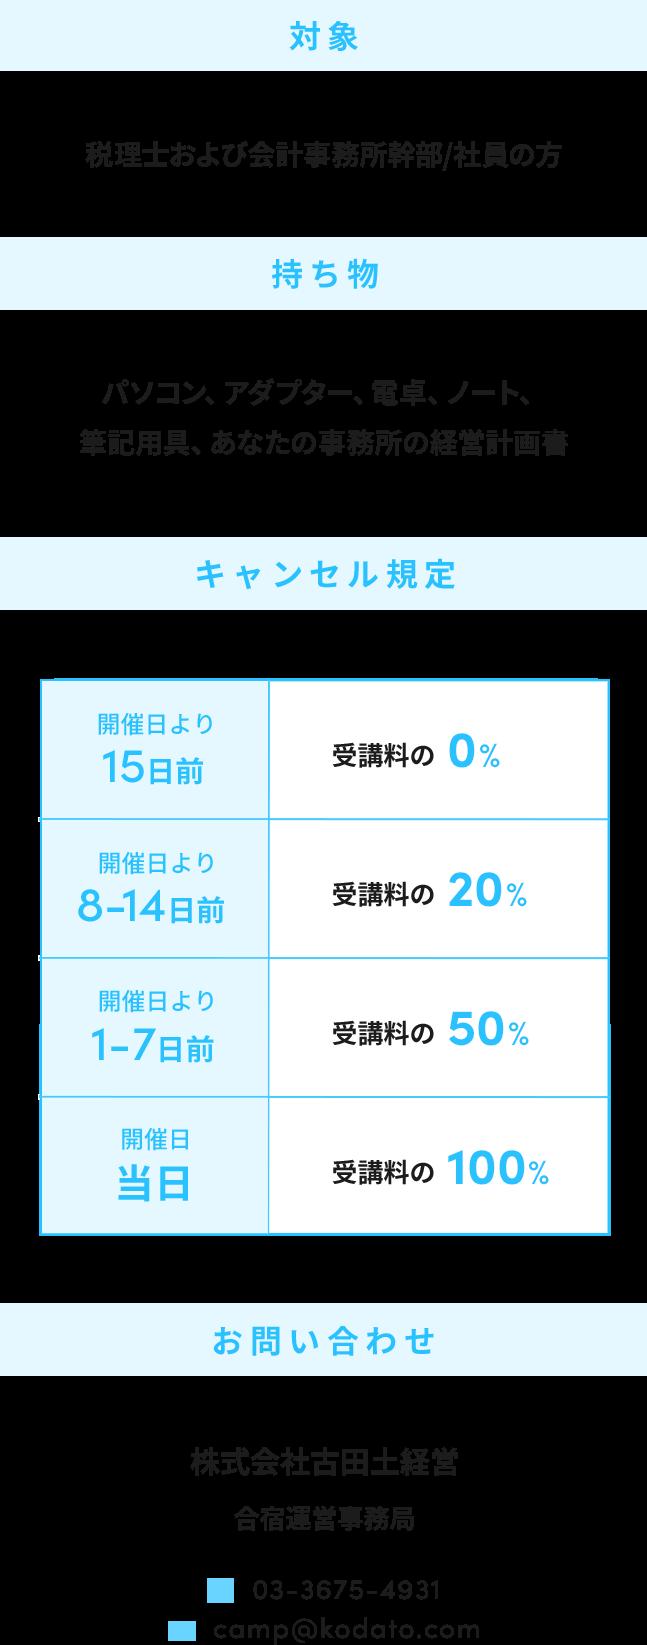 image03-2_sp